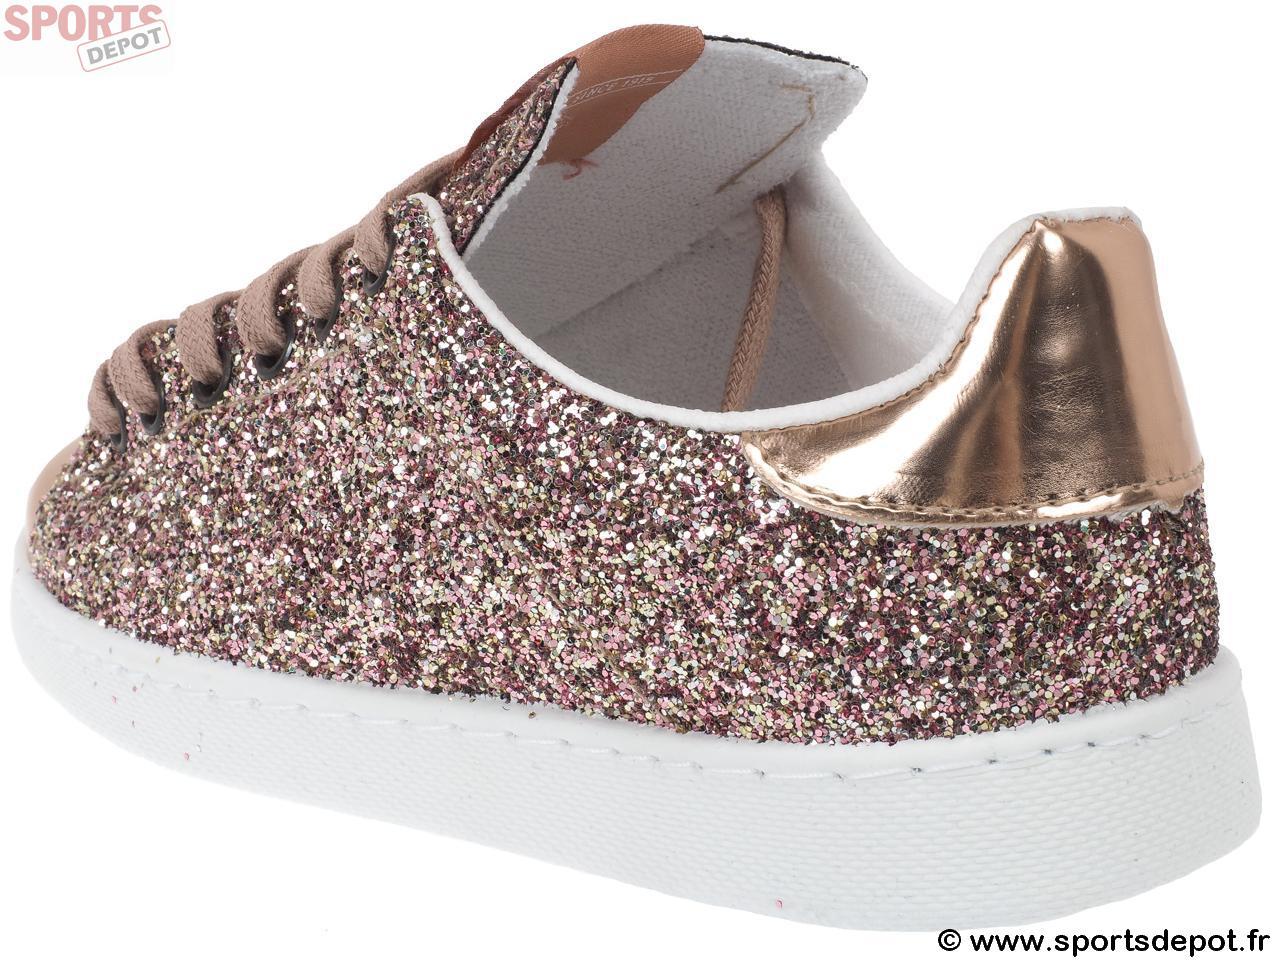 Basses Acheter Simili Victoria Cuir Chaussures Paillette Ou Rose 4w4qr5n